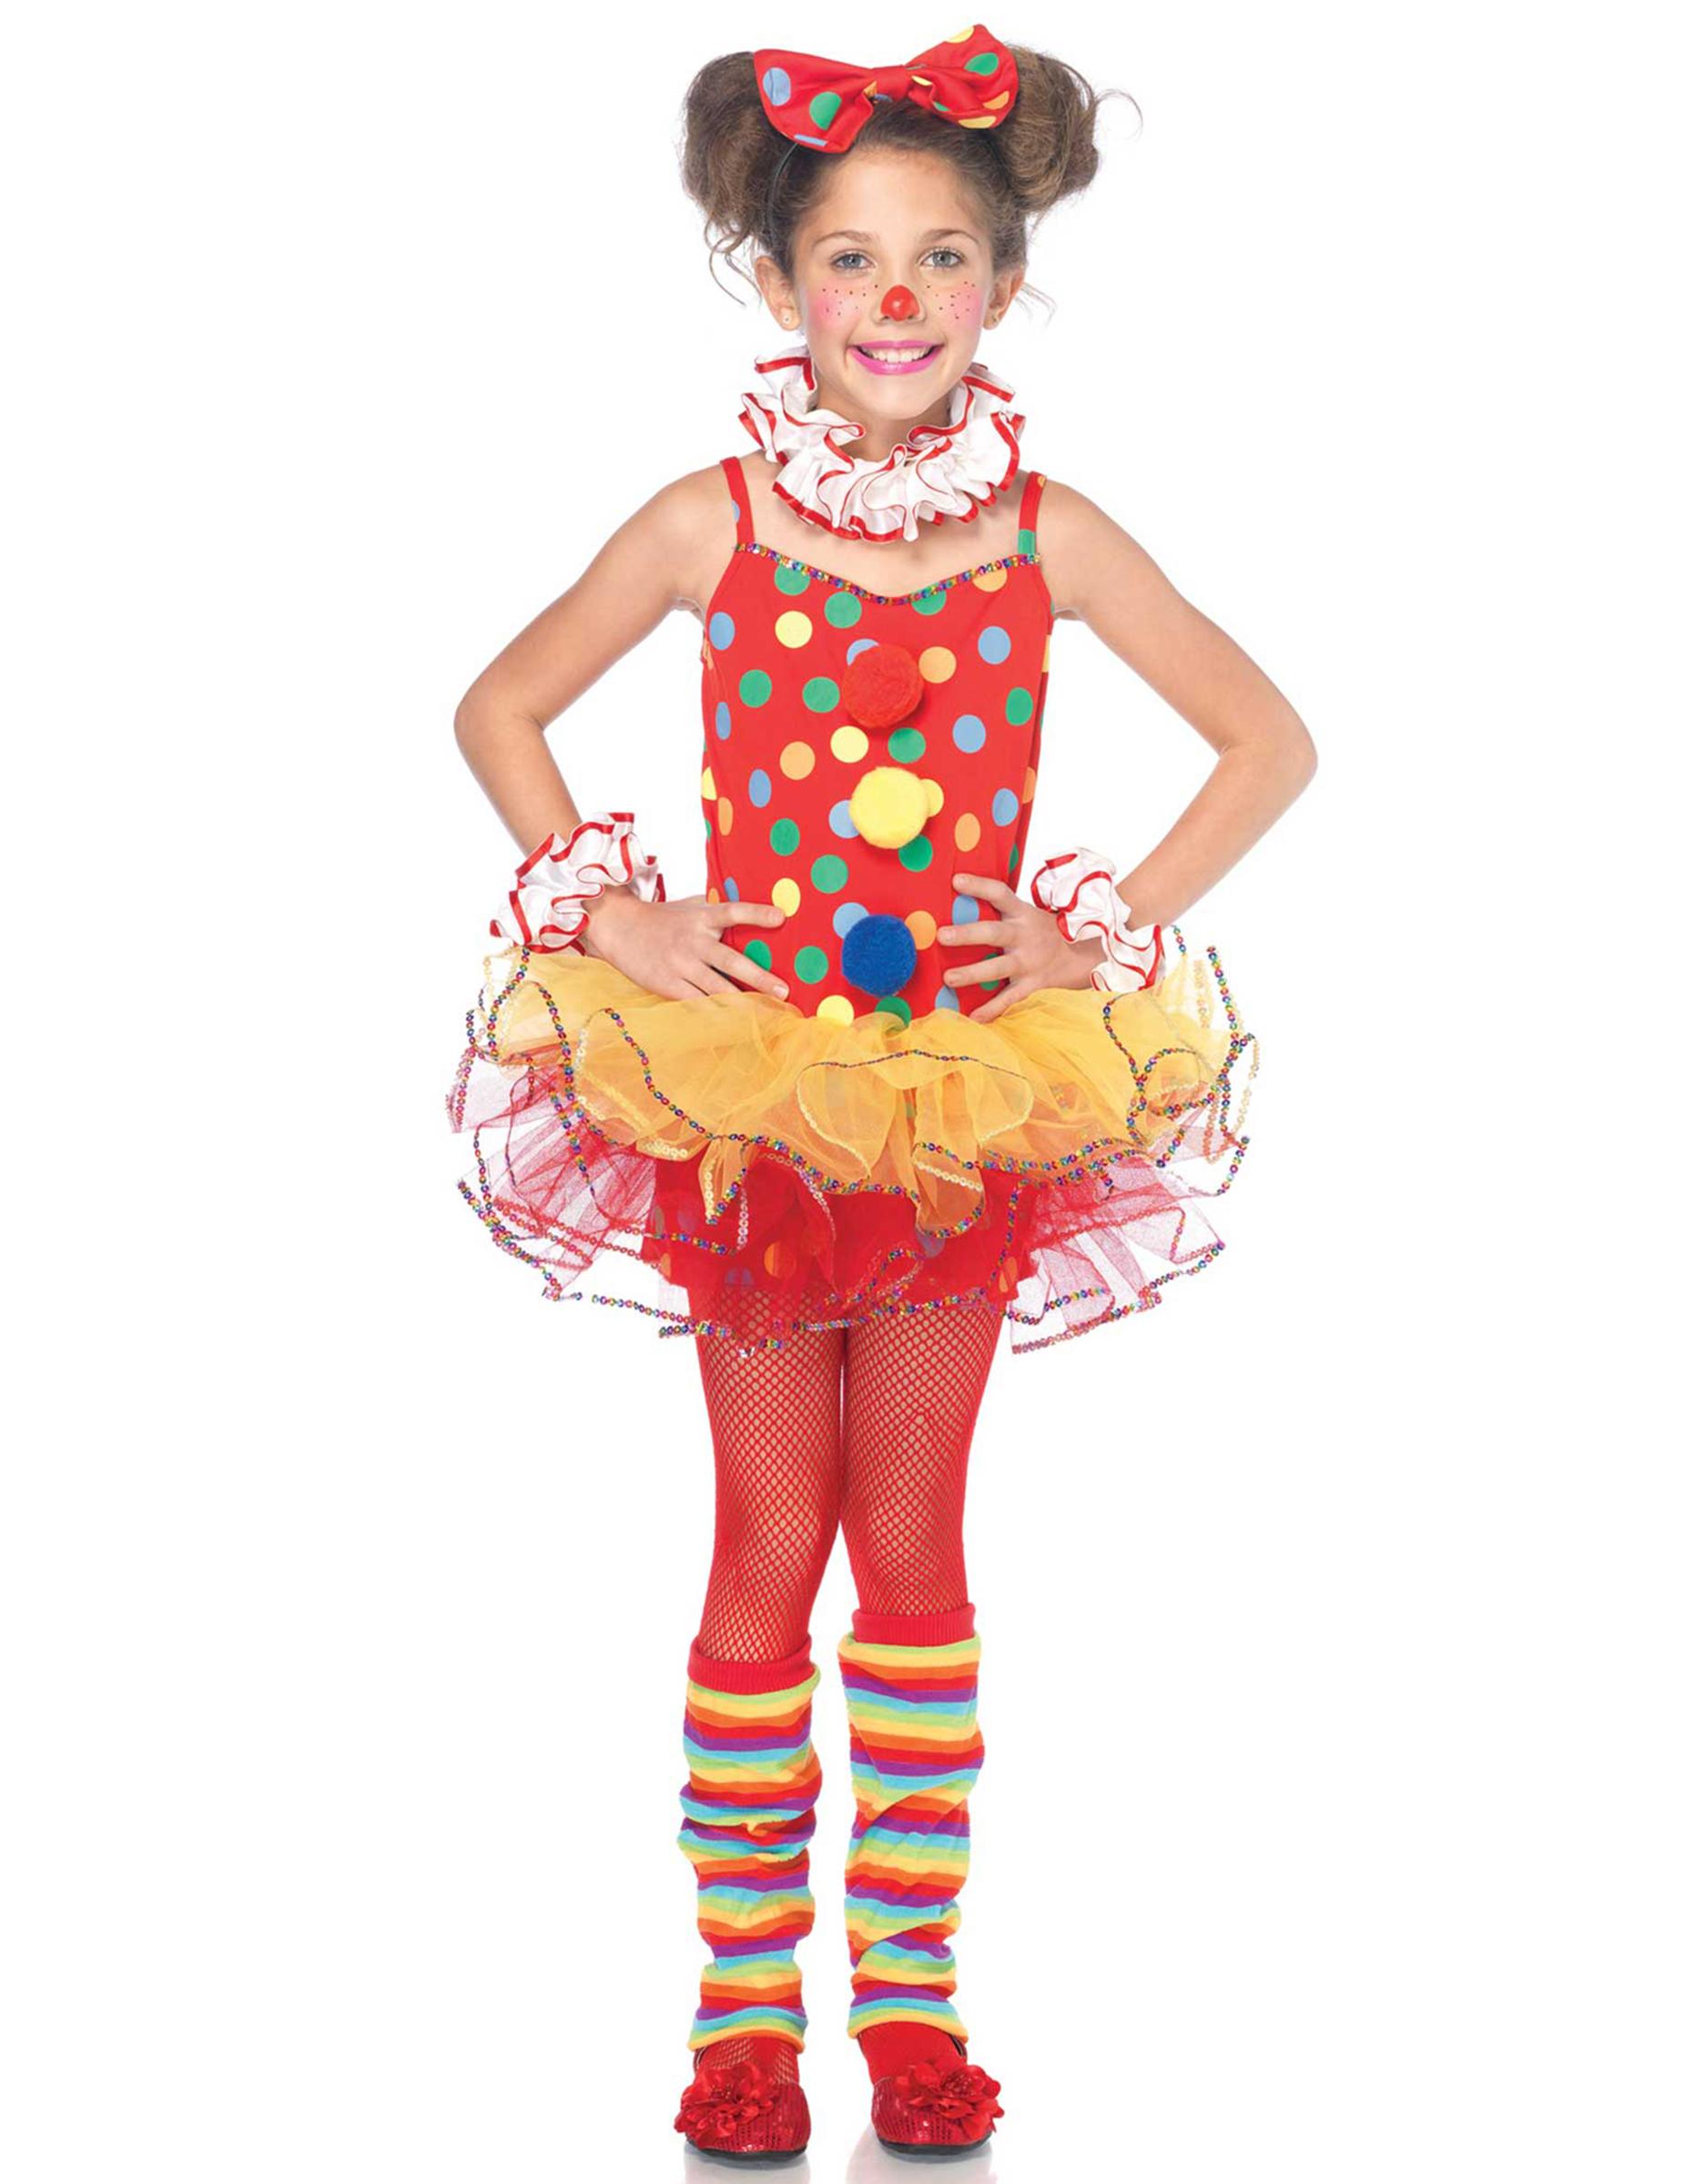 83121cbea54 Déguisement clown de cirque fille